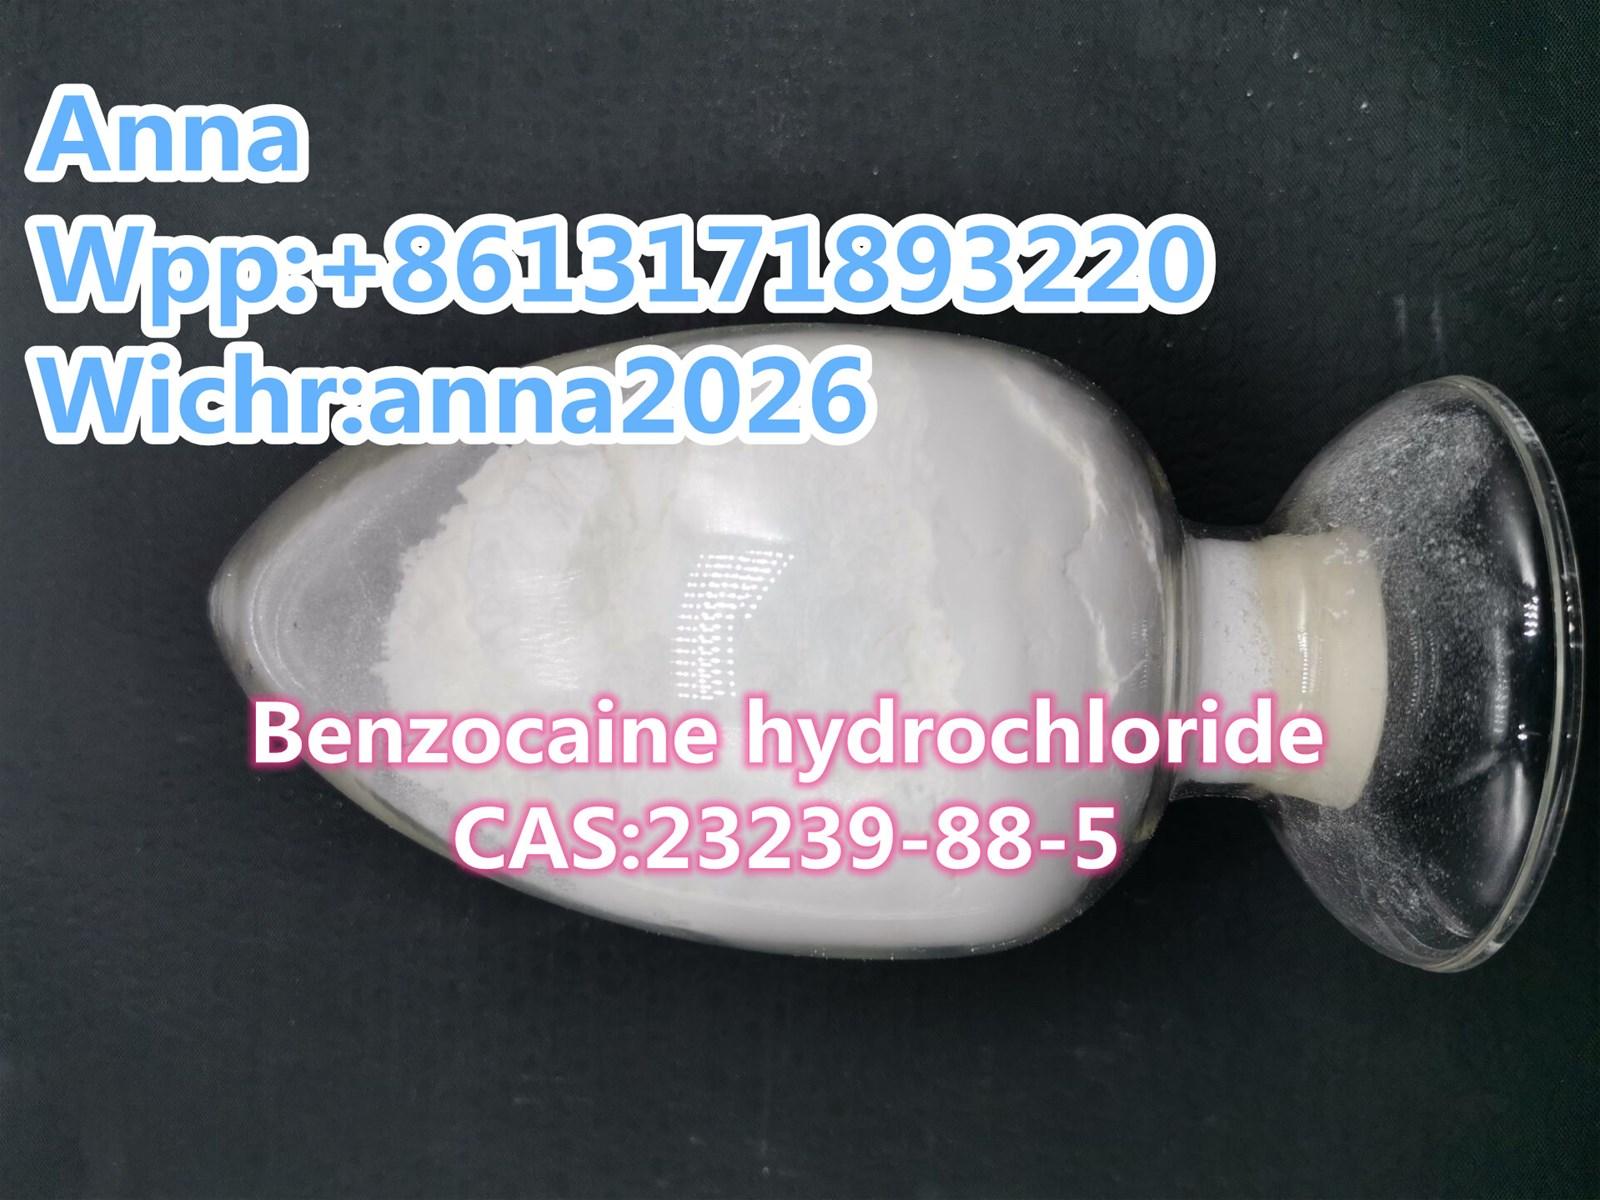 Benzocaine hydrochlorideEthyl paminobenzoate hydrochloride